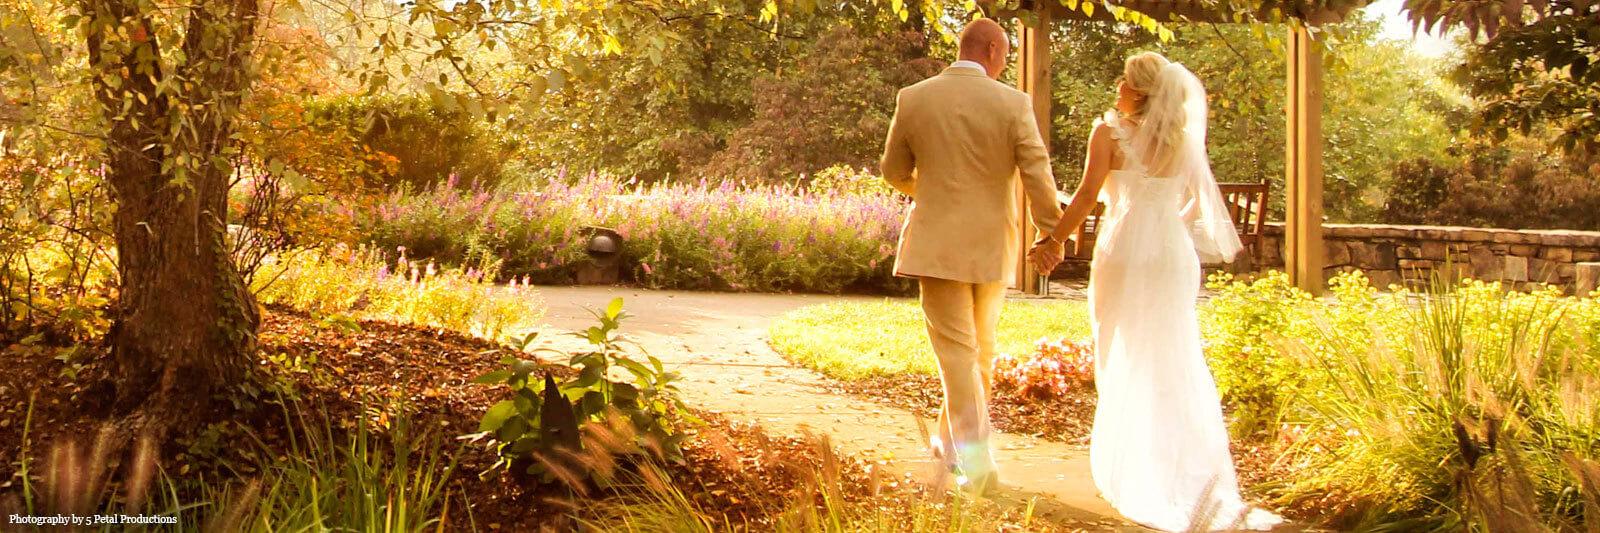 Brasstown-Valley-Outdoor-Wedding-Venue-Georgia-Wedding-Packages-2